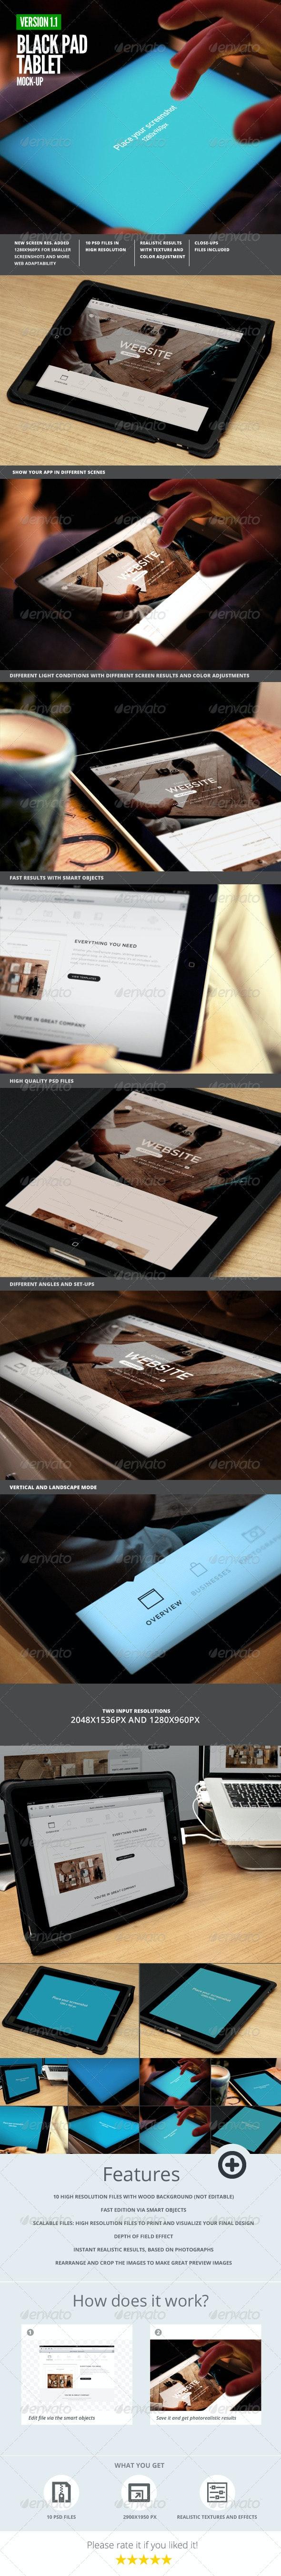 iPad Mockups Bundle - Mobile Displays